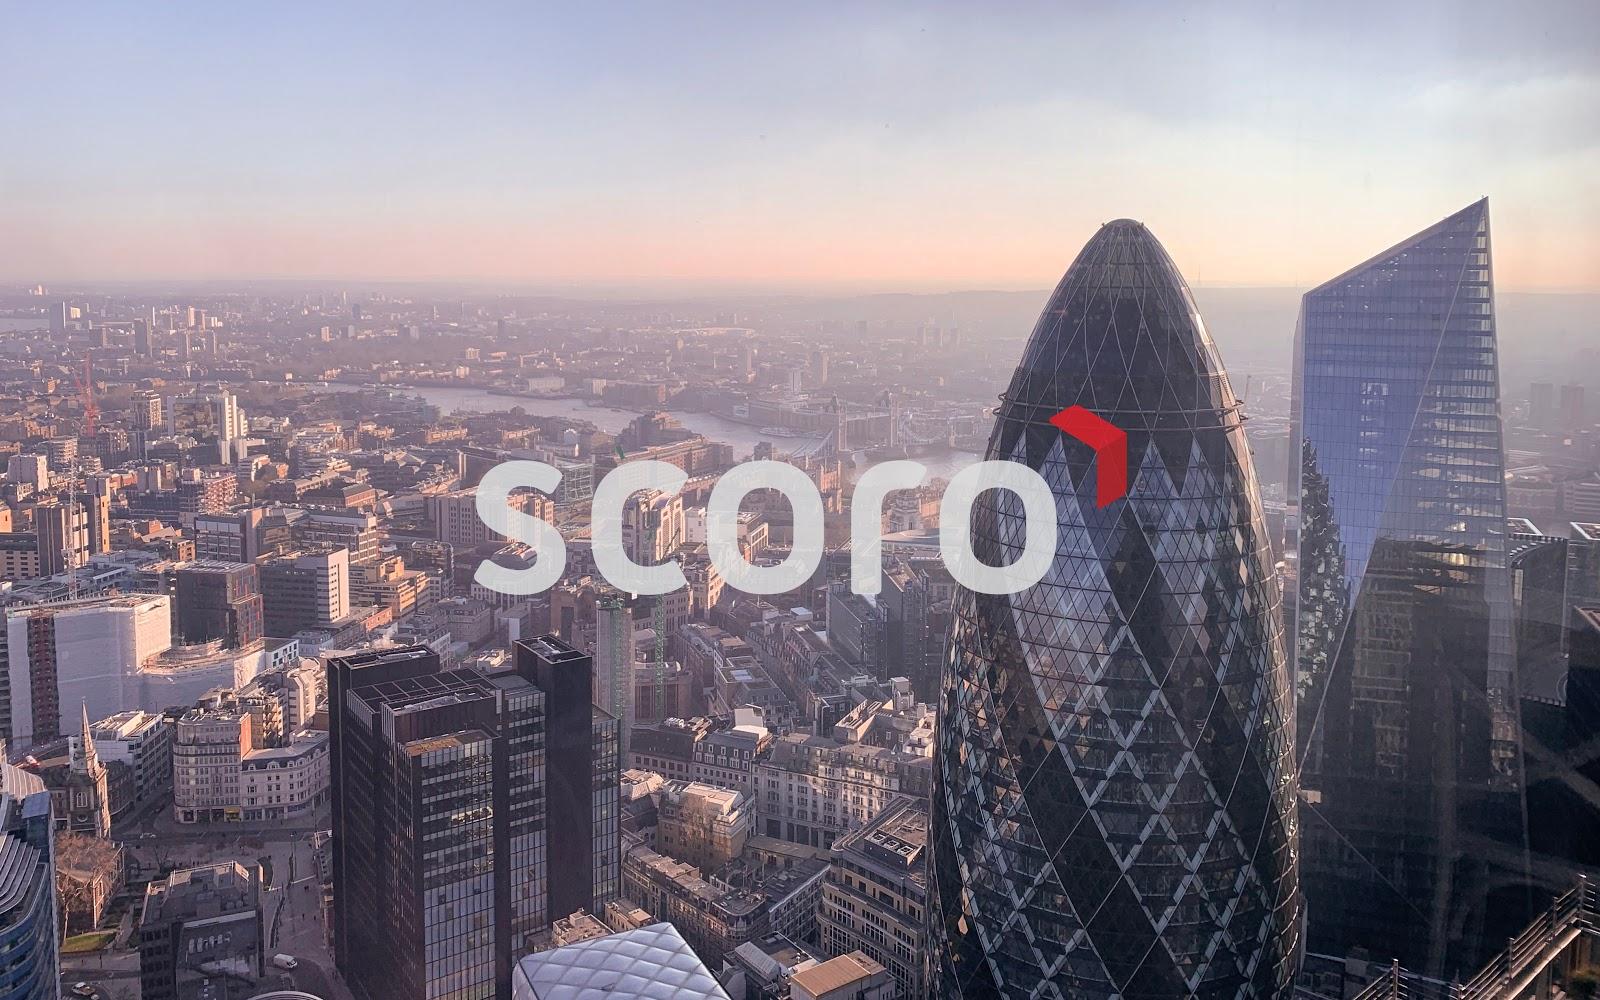 Scoro London office opening